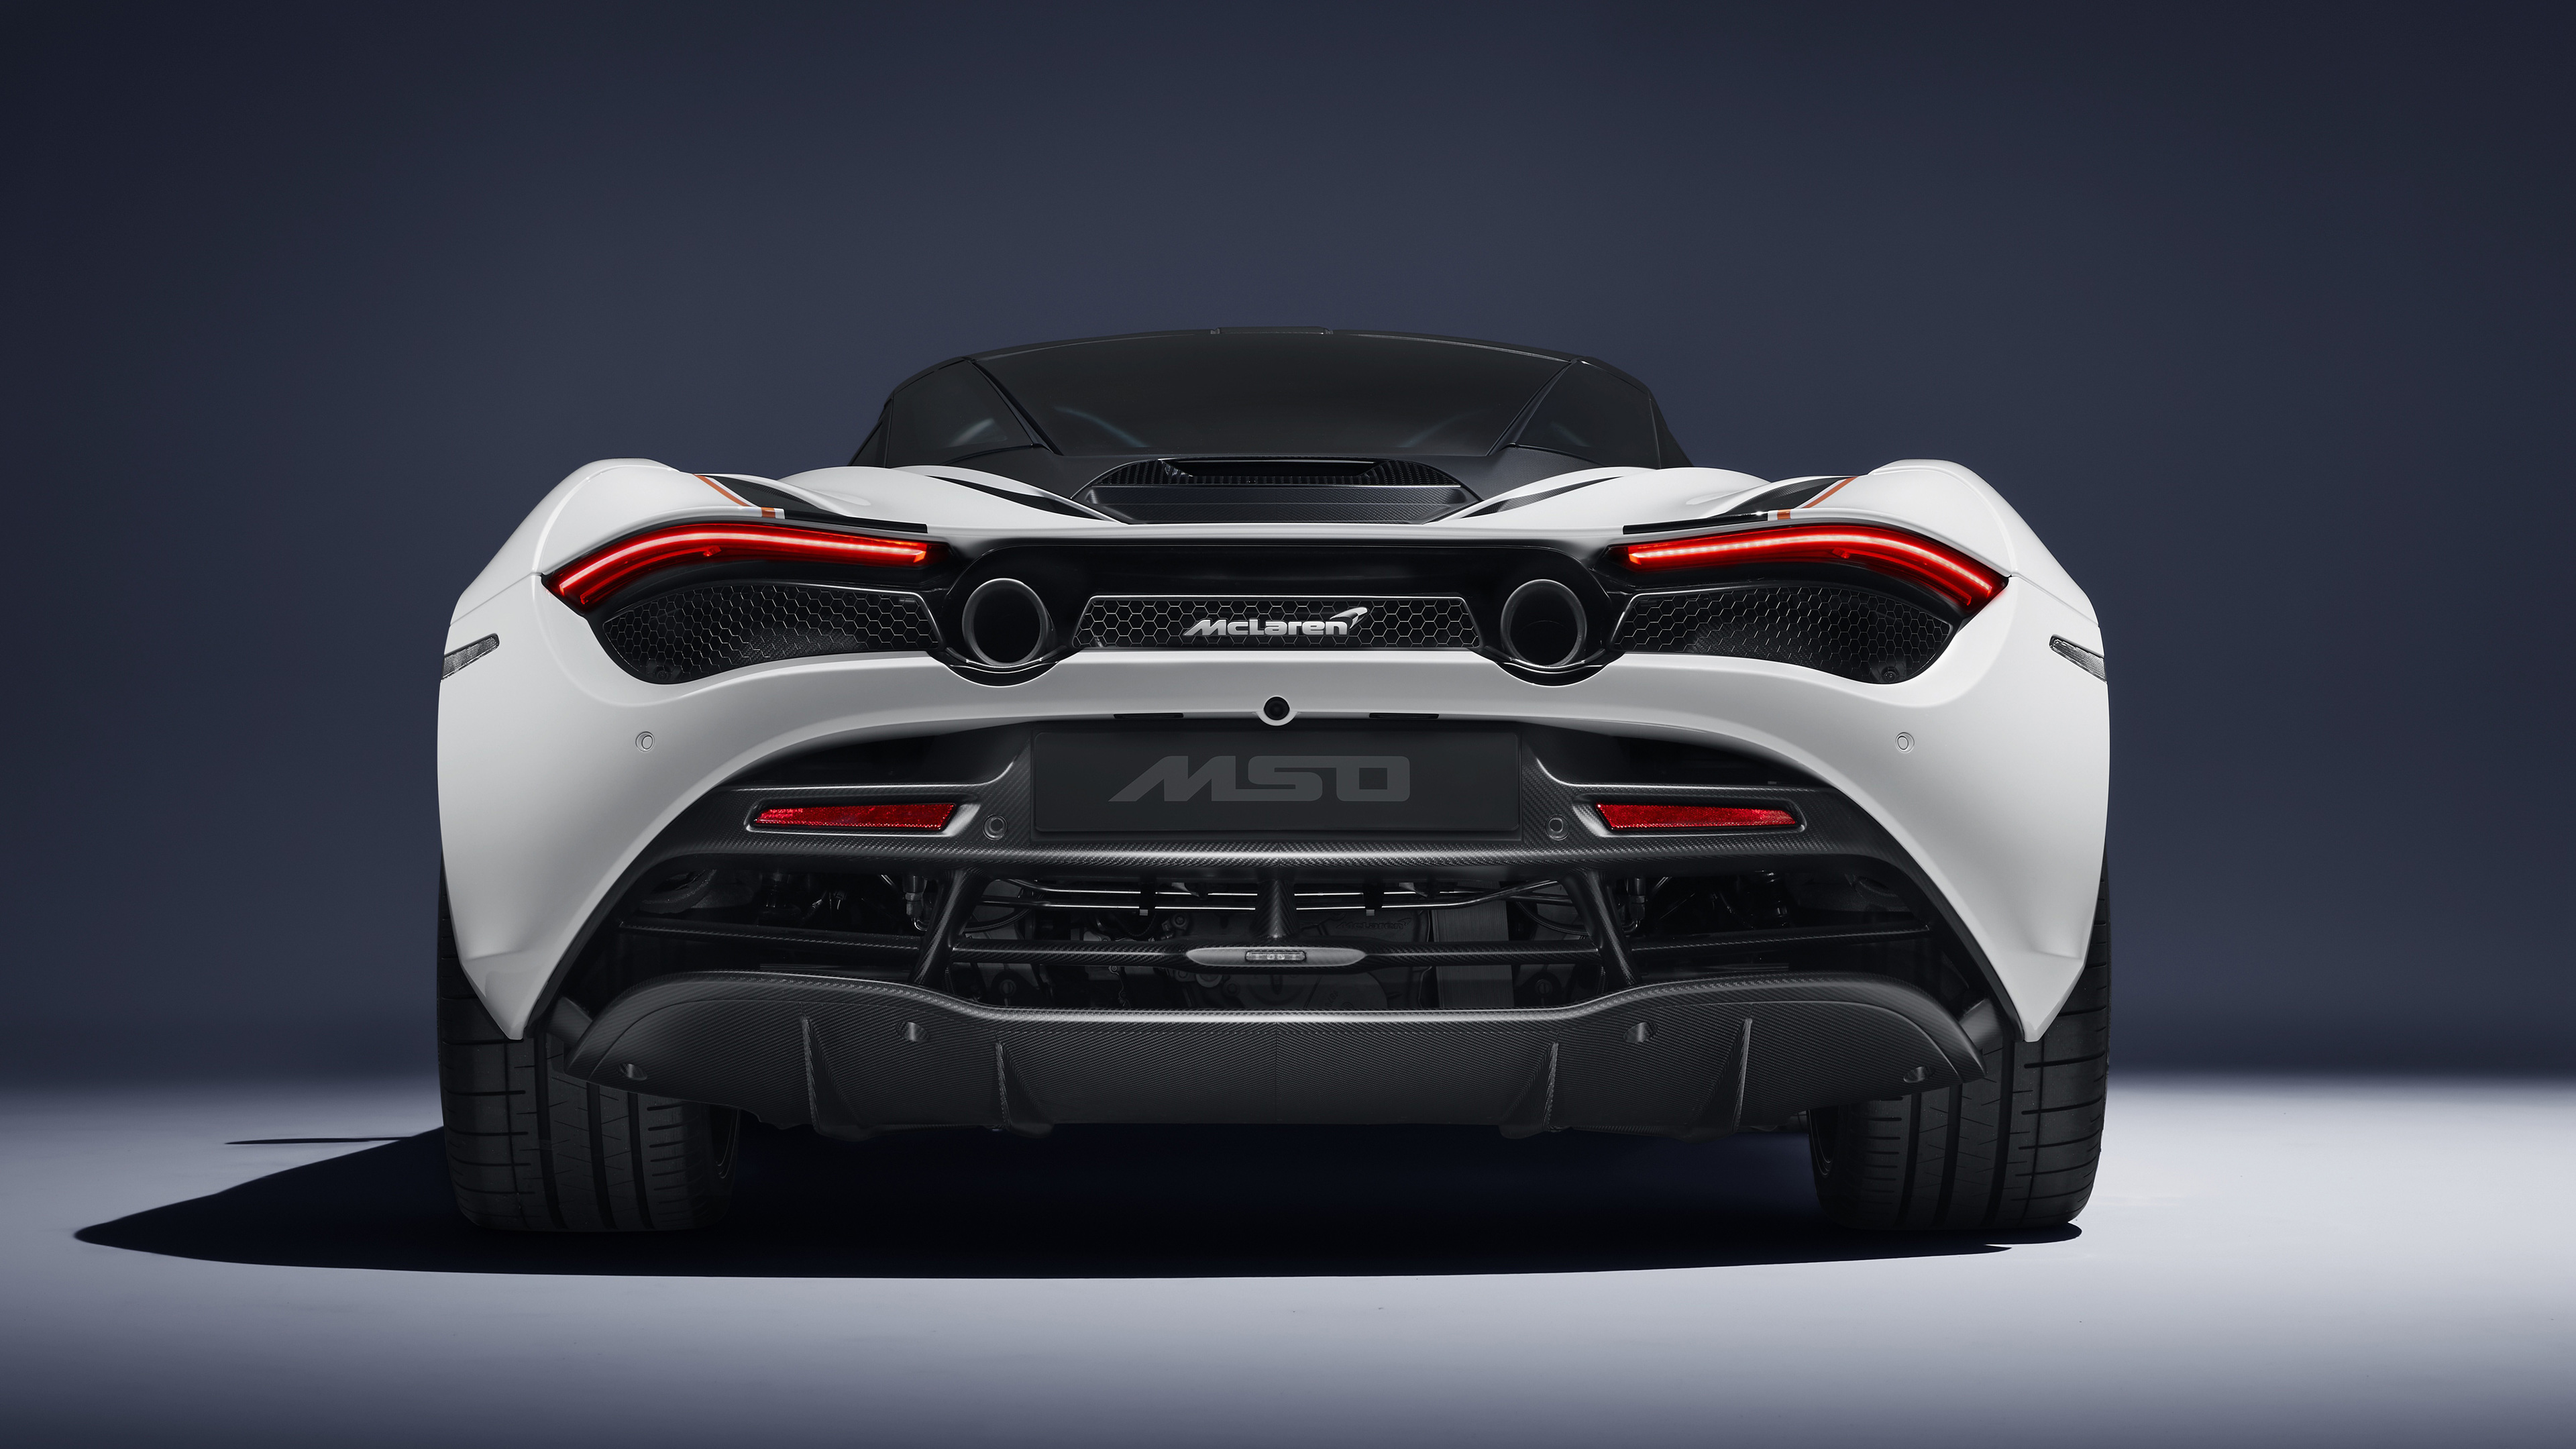 mclaren mso 720s track theme 2018 rear 1539113872 - McLaren MSO 720S Track Theme 2018 Rear - mclaren wallpapers, mclaren 720s wallpapers, hd-wallpapers, cars wallpapers, 4k-wallpapers, 2018 cars wallpapers